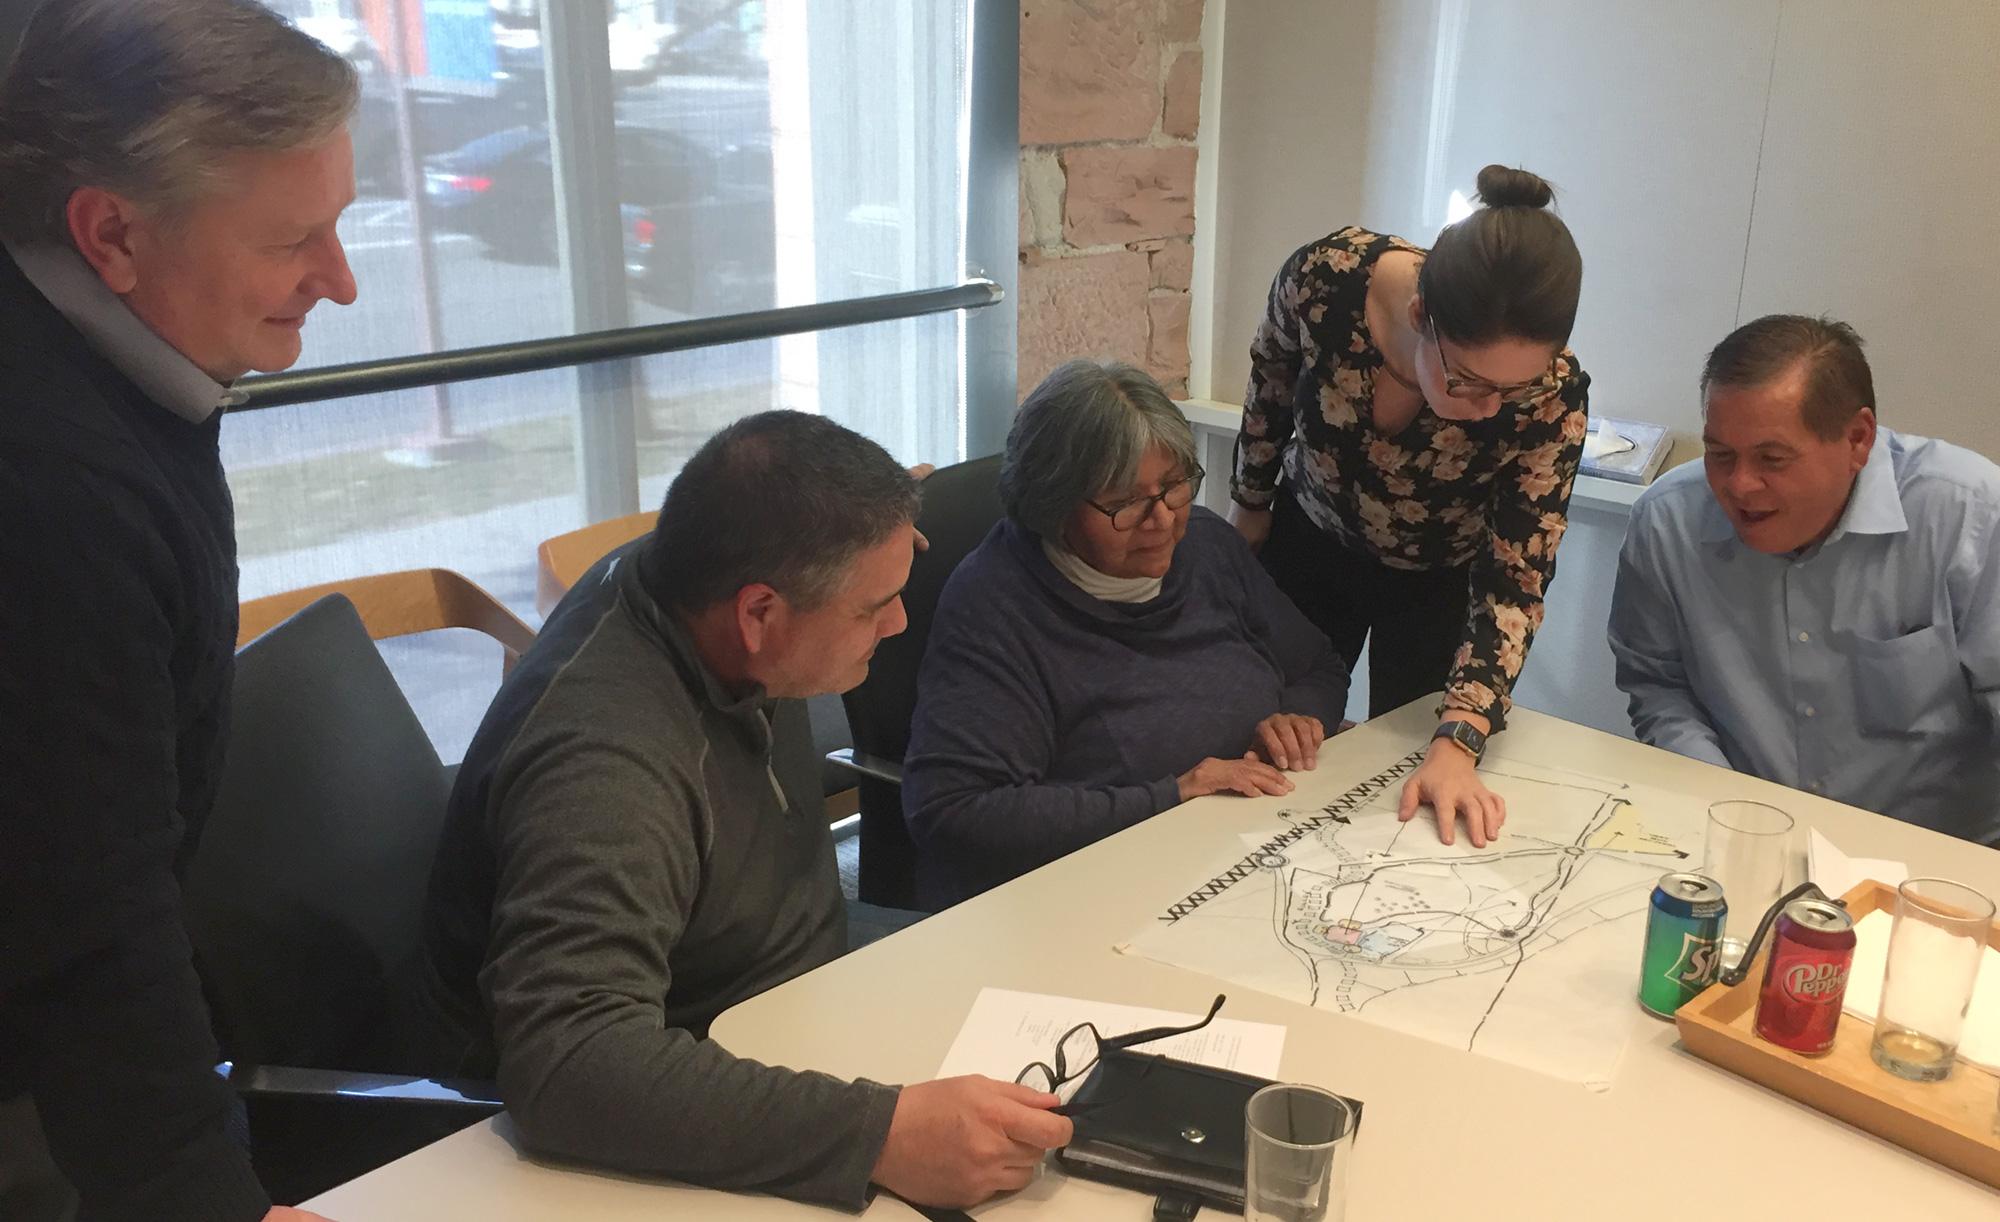 Visioning meeting at GSBS Architects